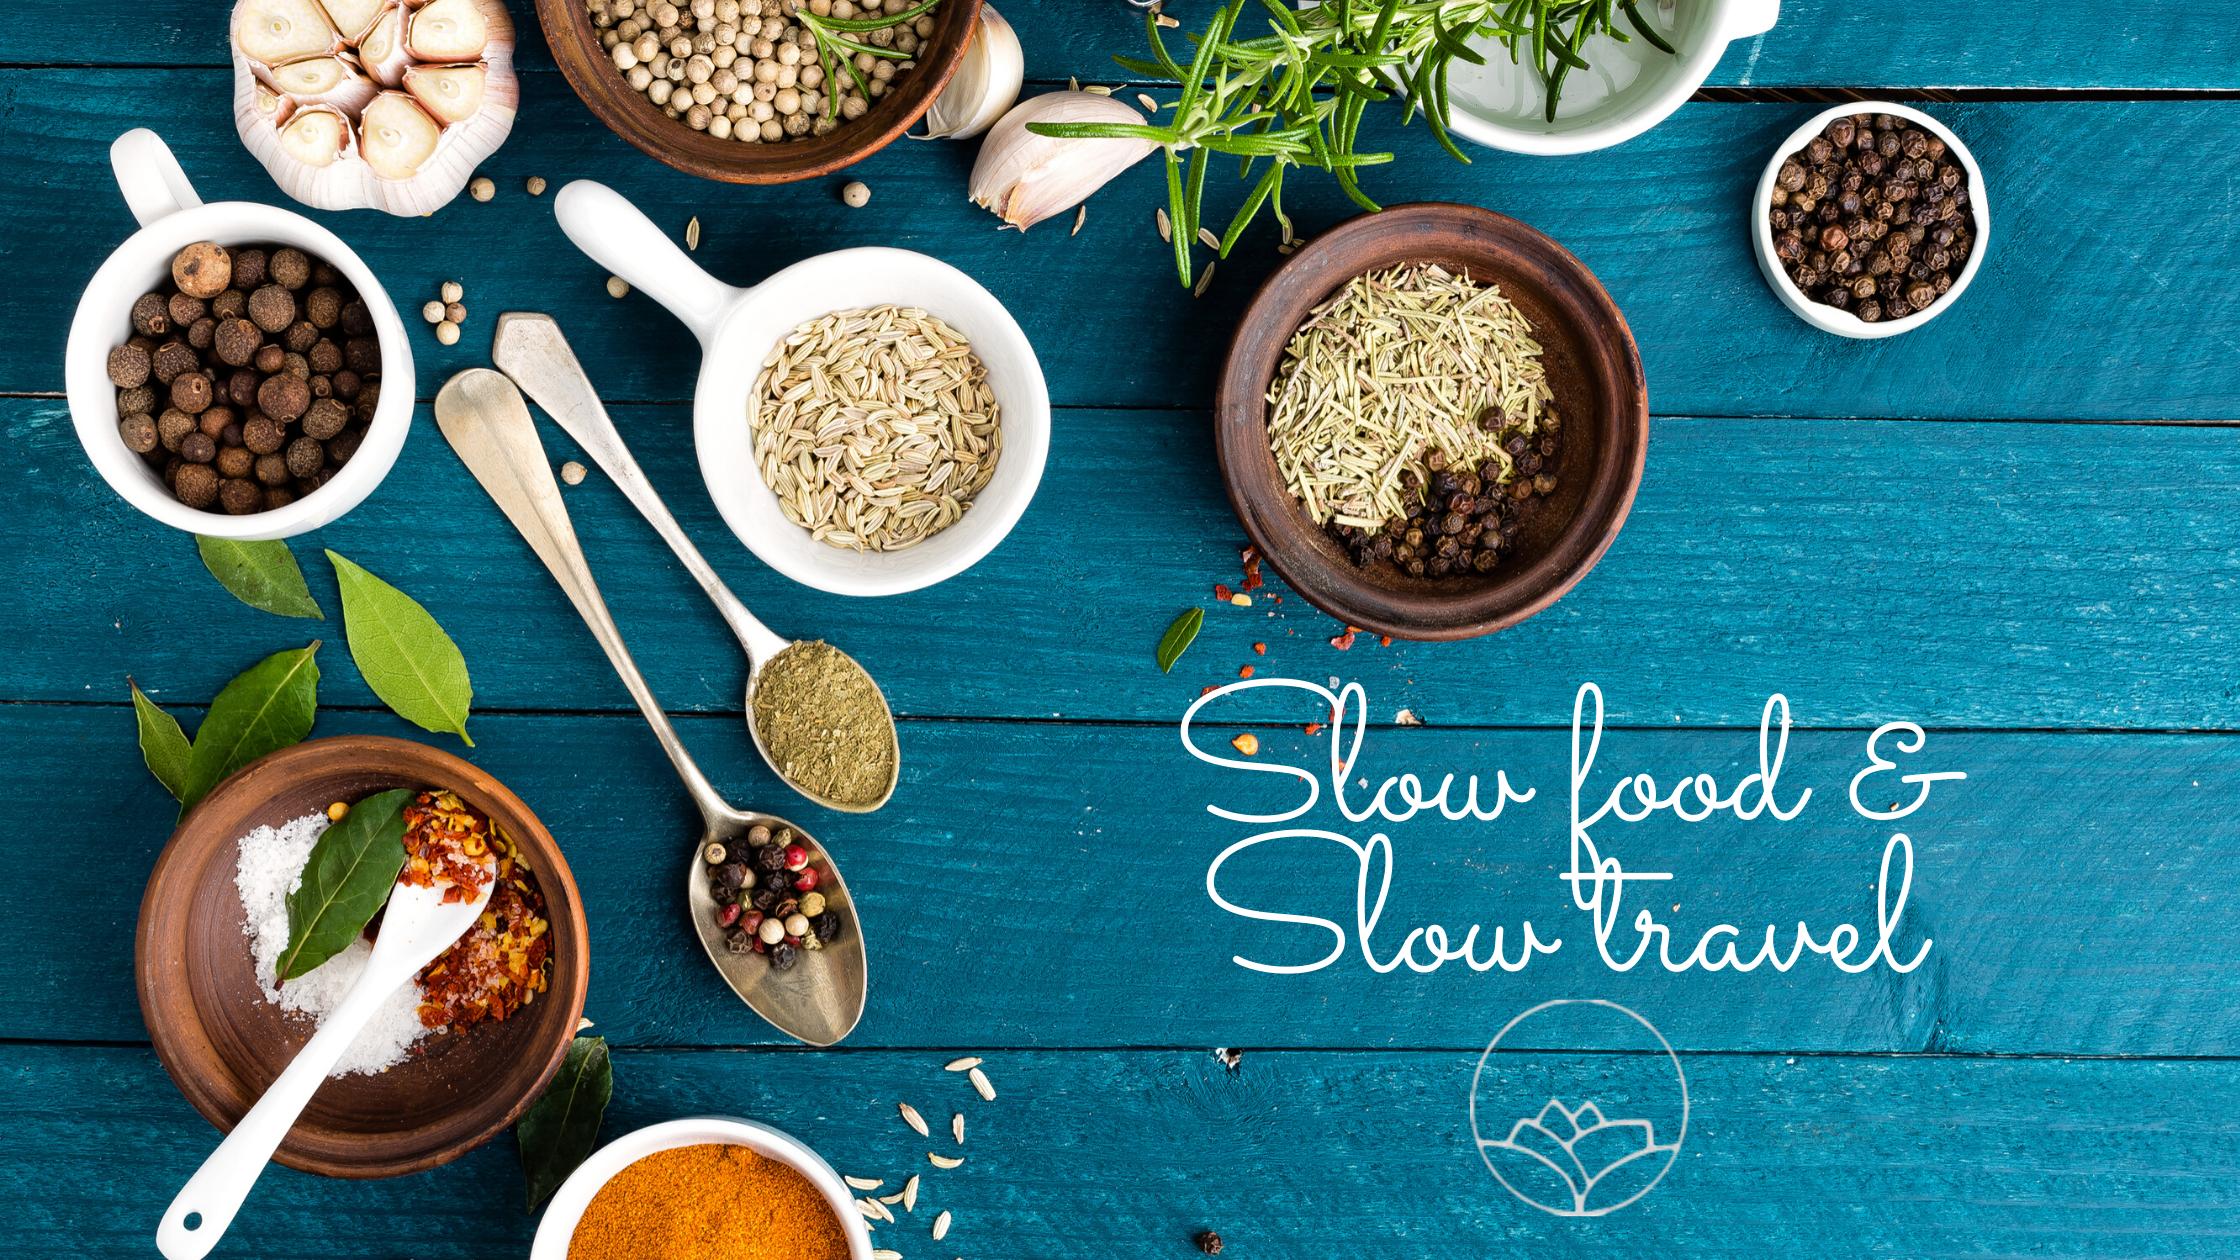 Slow food & Slow travel